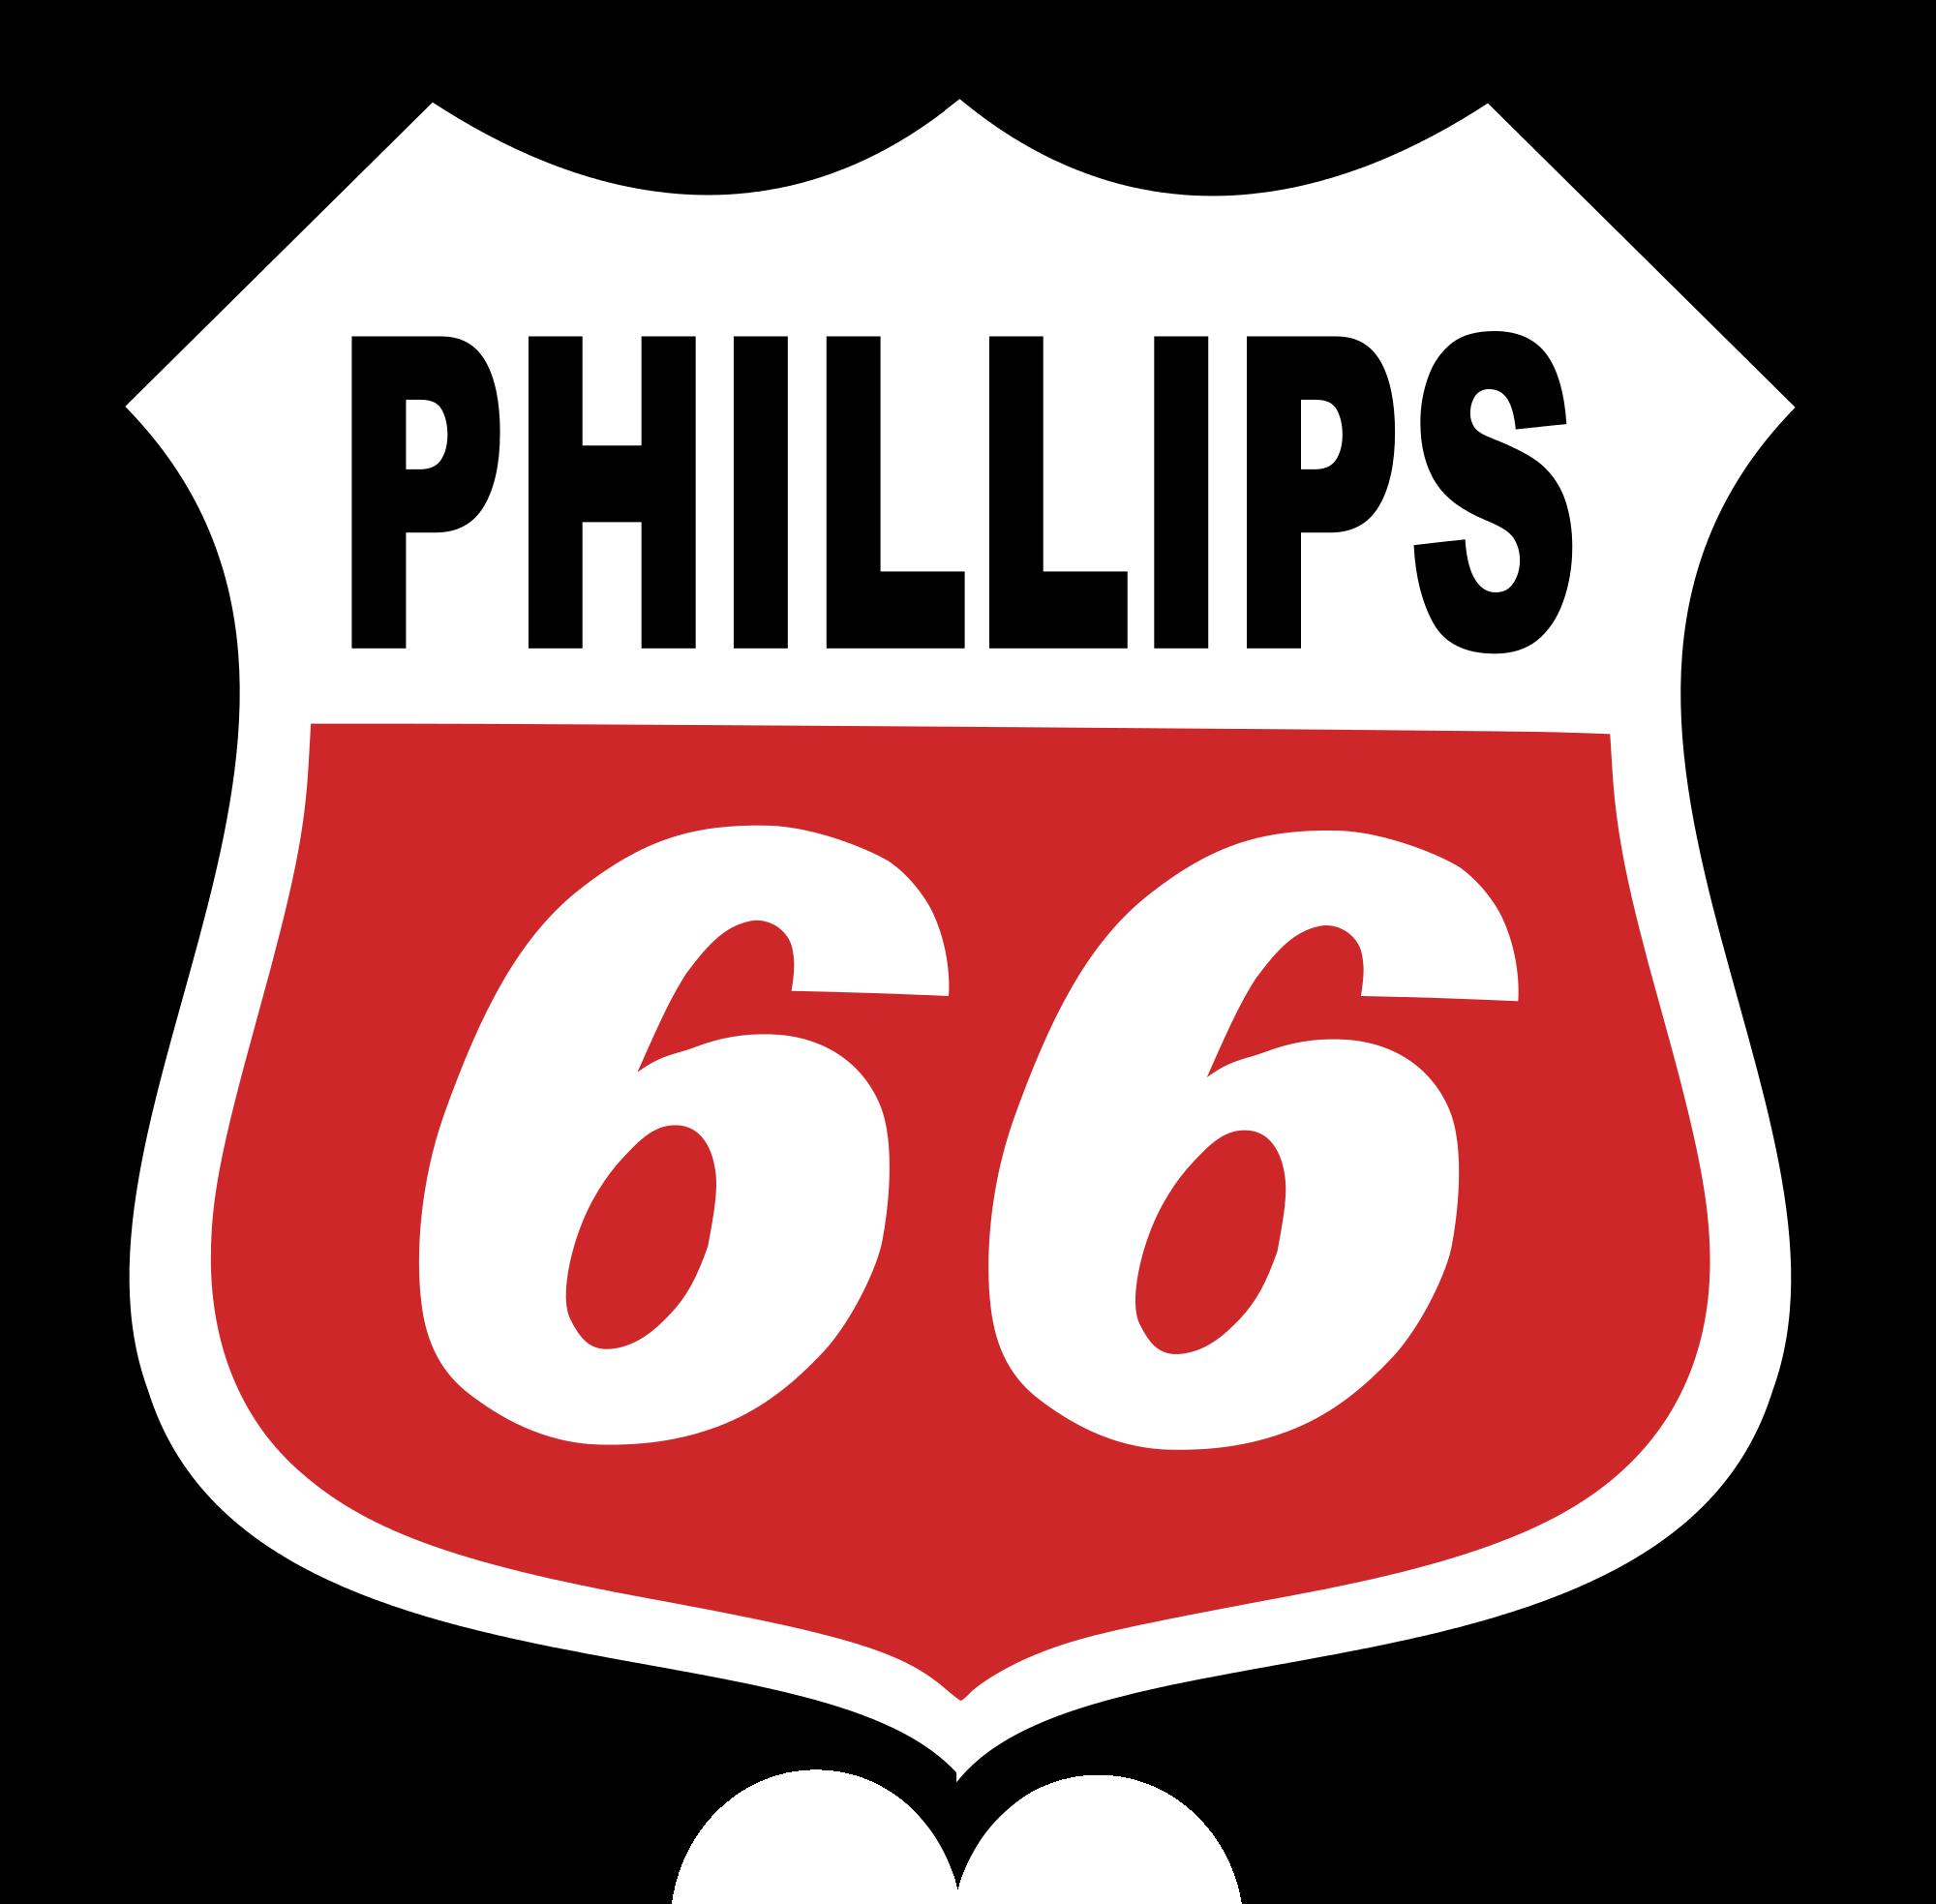 Phillips 66 Philgear Industrial Lube 68 Cross Ref